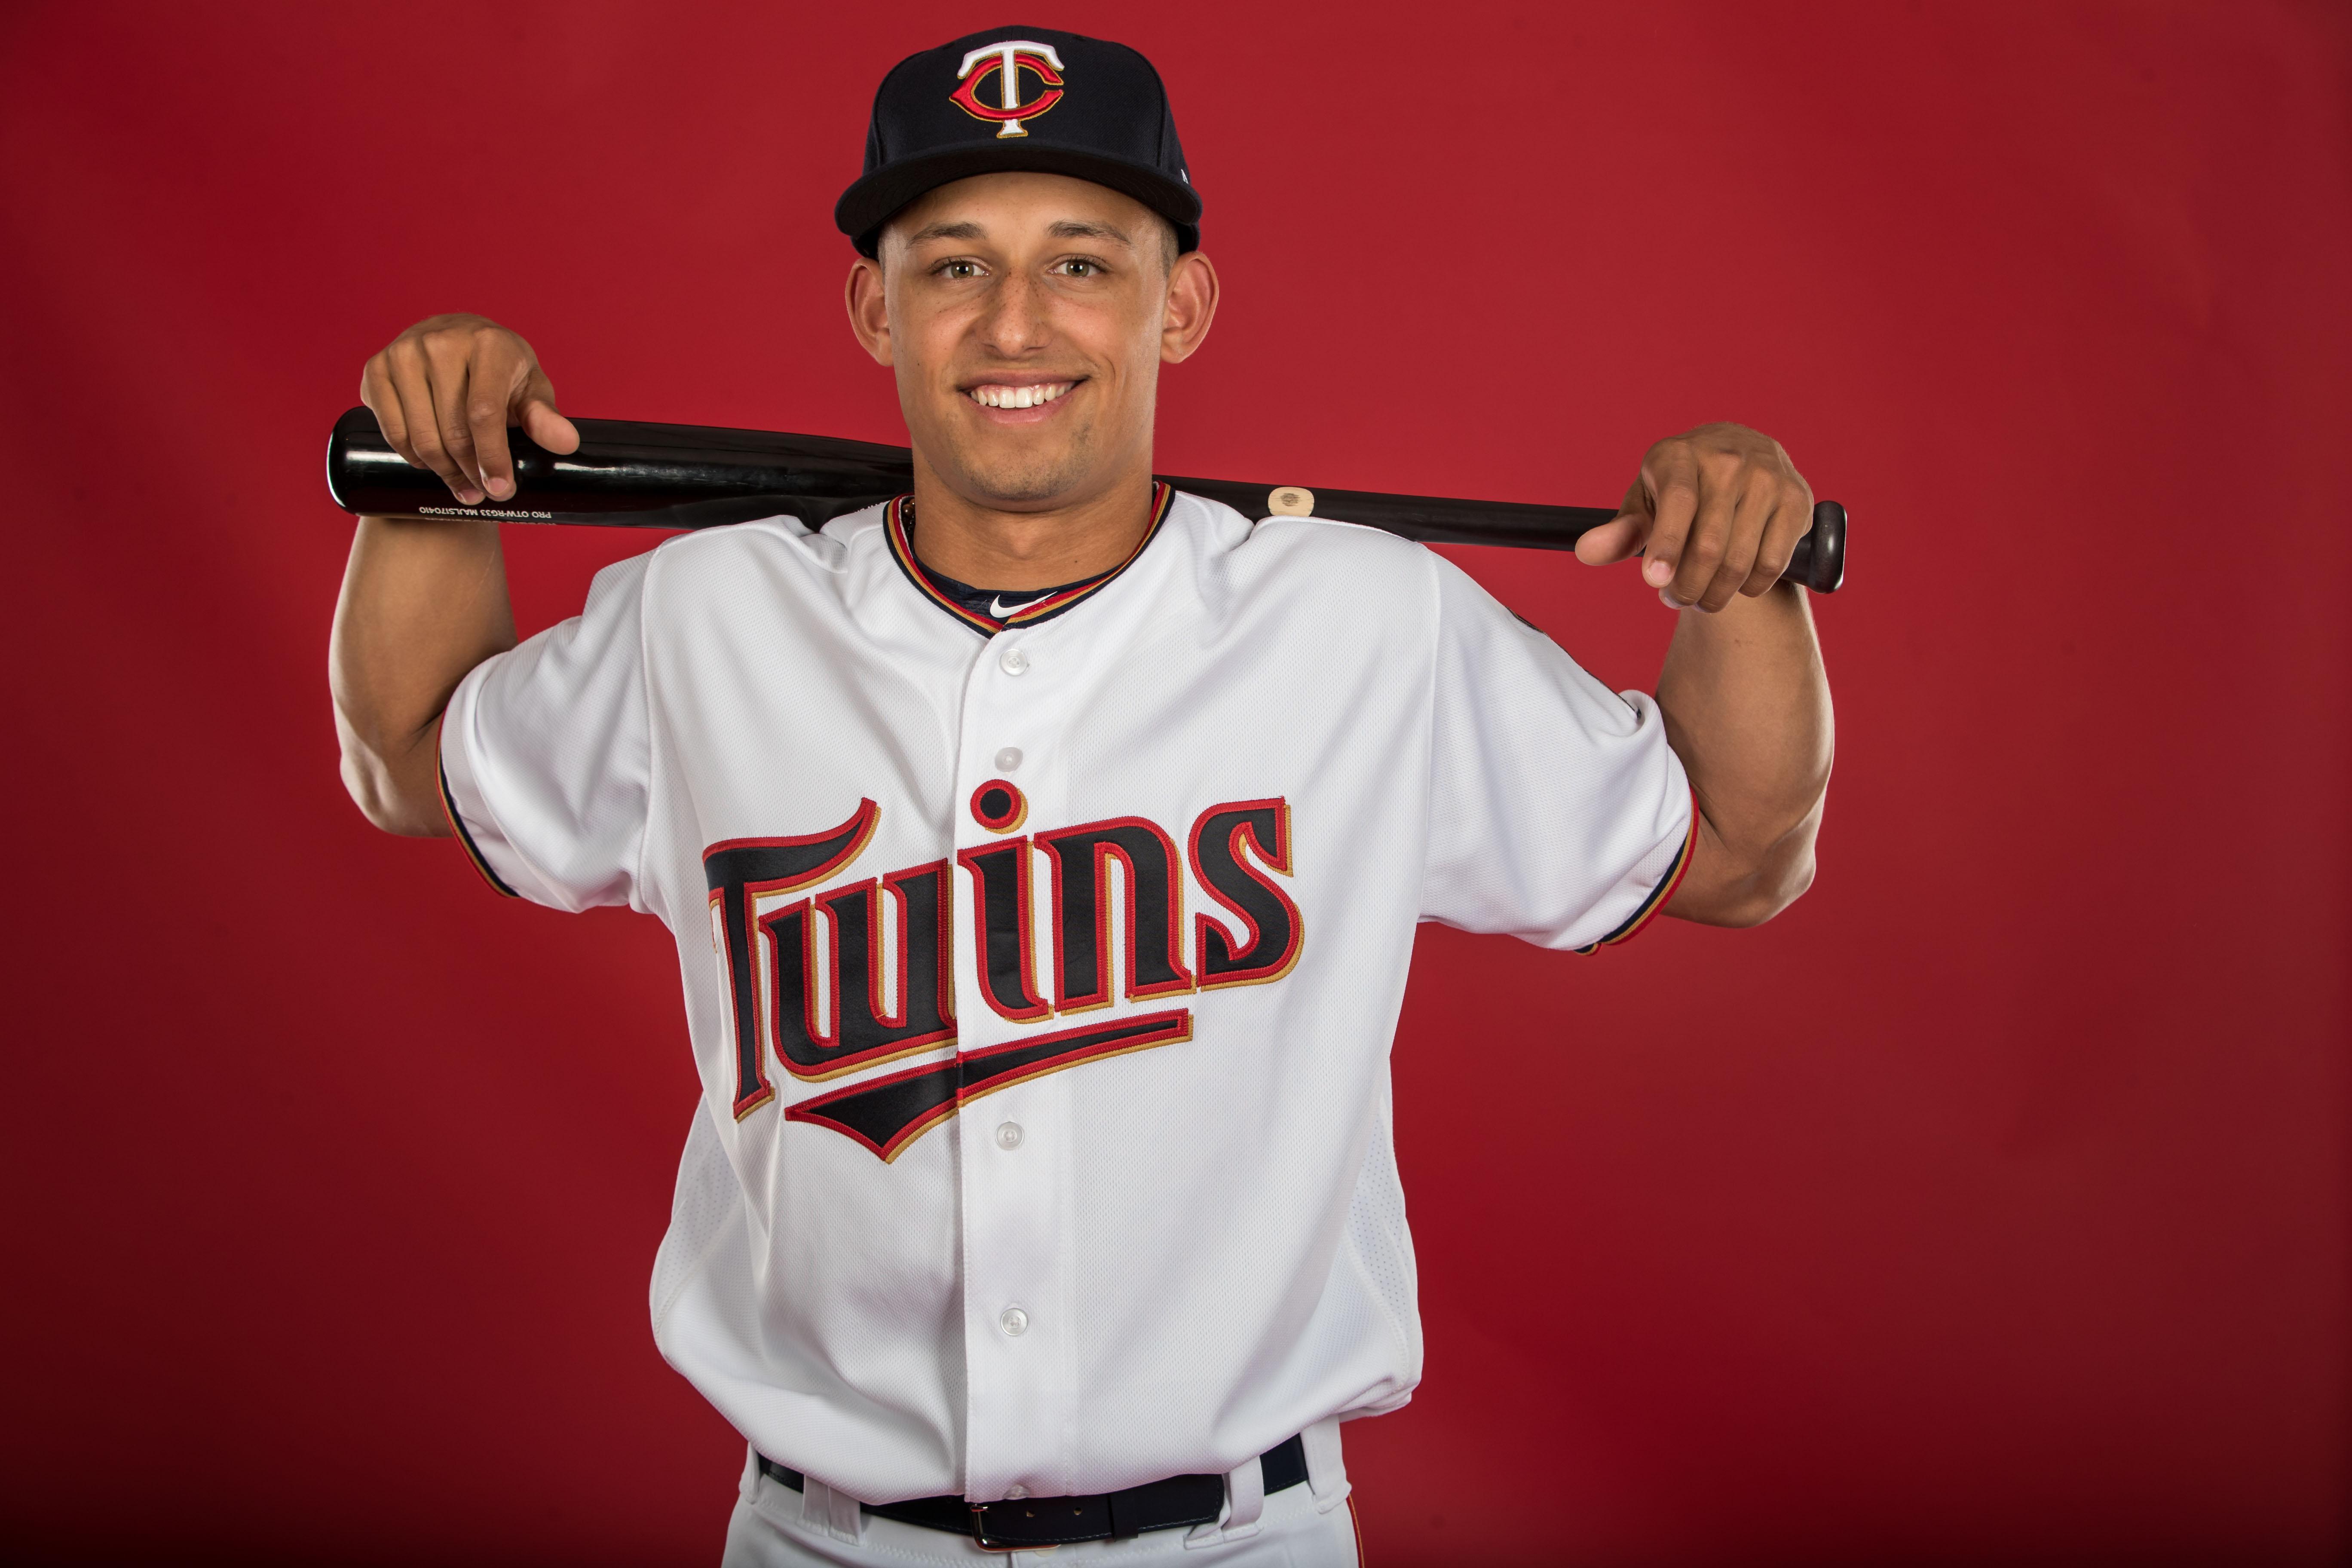 Royce Lewis was drafted as a shortstop out of JSerra Catholic High School. Photo: Brace Hemmelgarn/Minnesota Twins